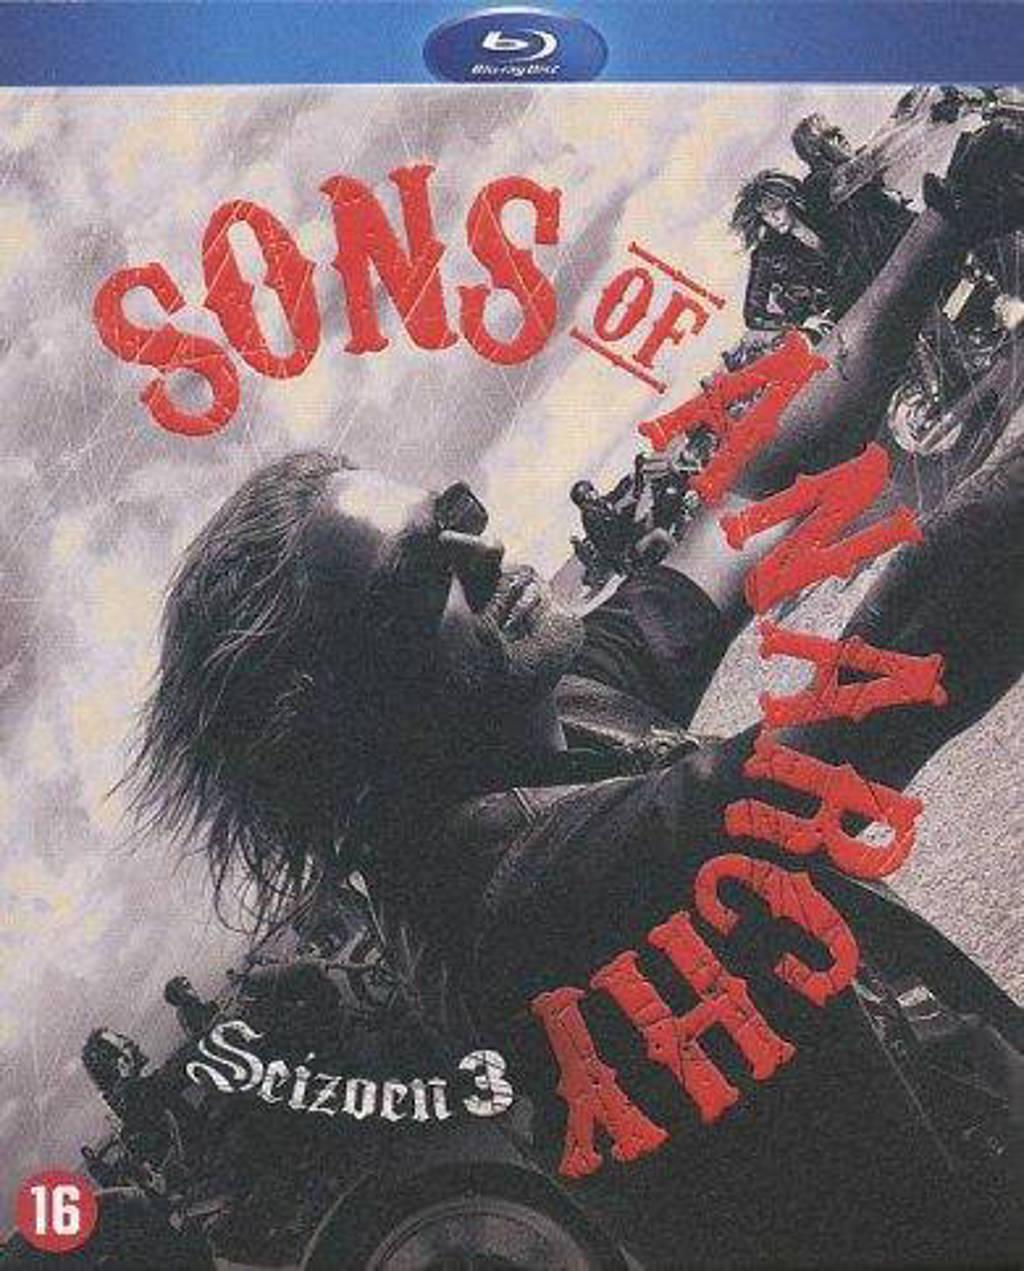 Sons of anarchy - Seizoen 3 (Blu-ray)